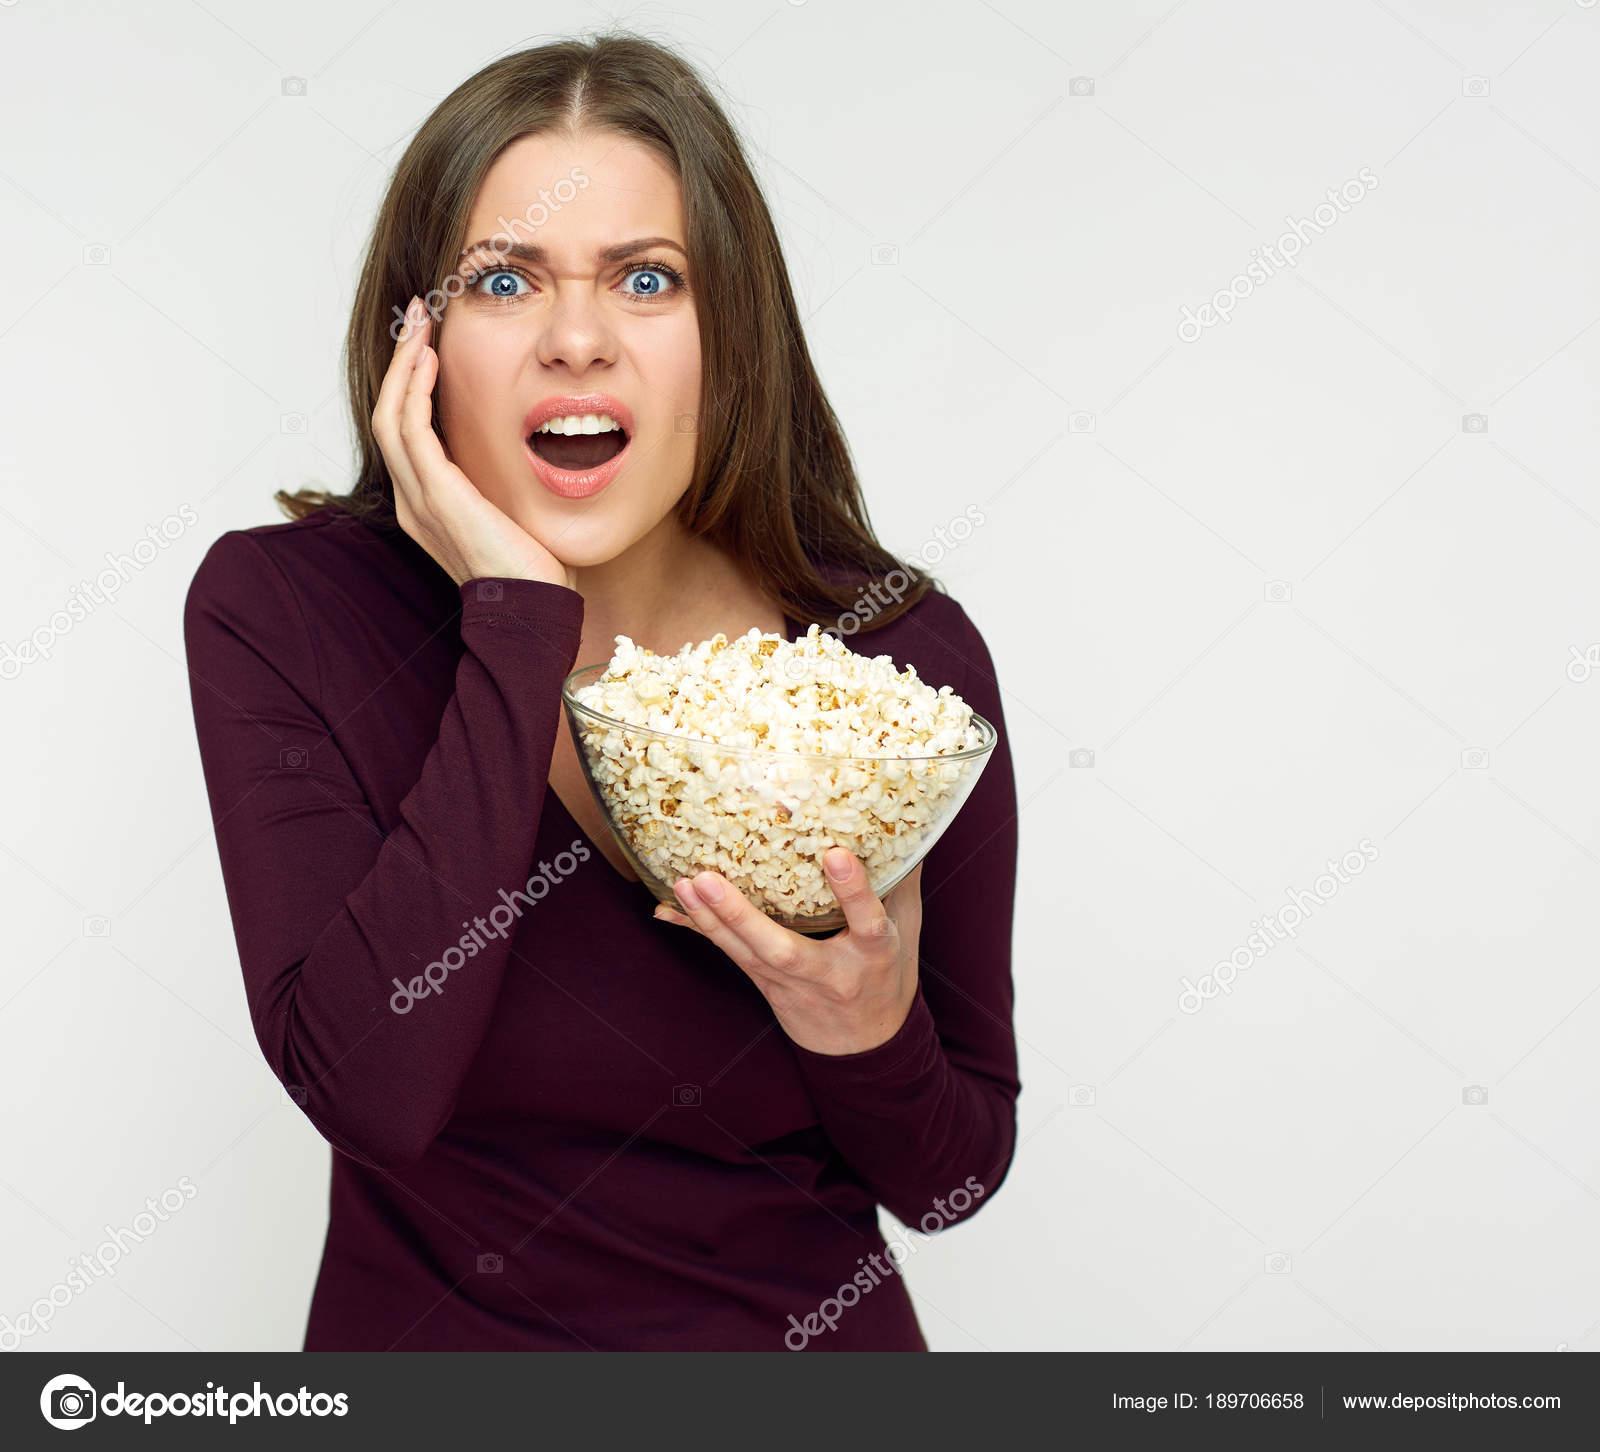 surprising woman long hair holding glass bowl popcorn stock photo